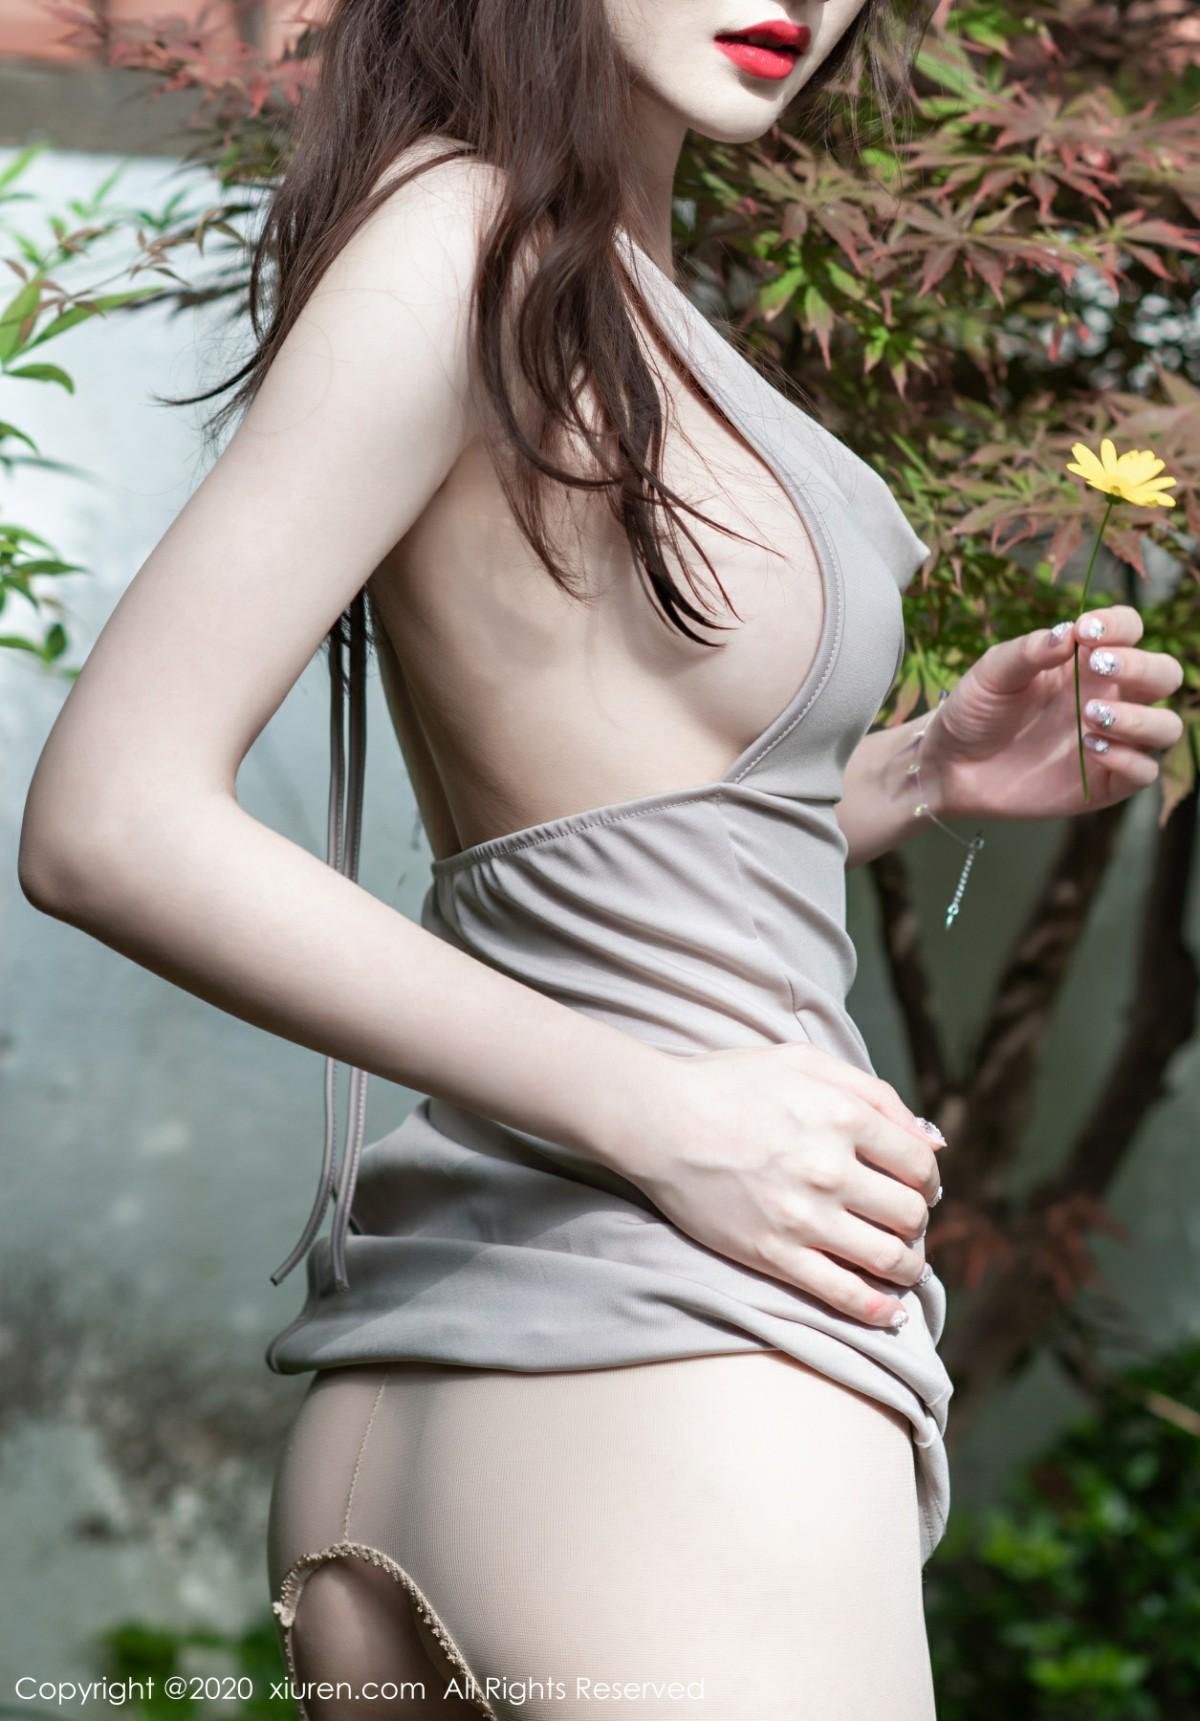 [XiuRen秀人网]2020.03.23 No.2089 沈梦瑶[41P] 秀人网 第2张